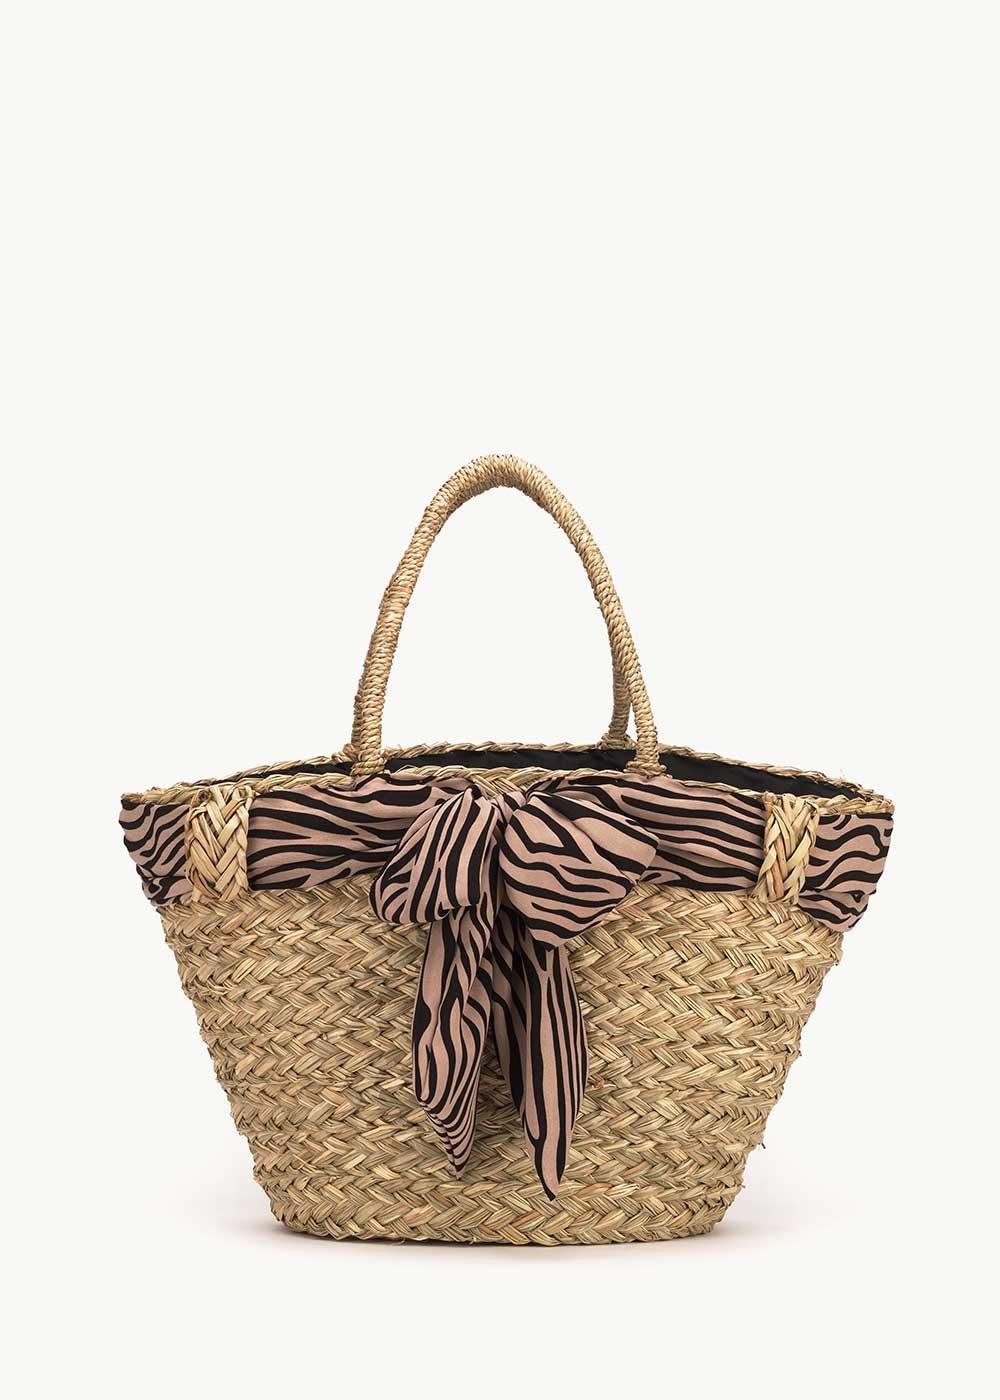 Balk straw beach bag with zebra patterned scarf - Light Beige Animalier - Woman